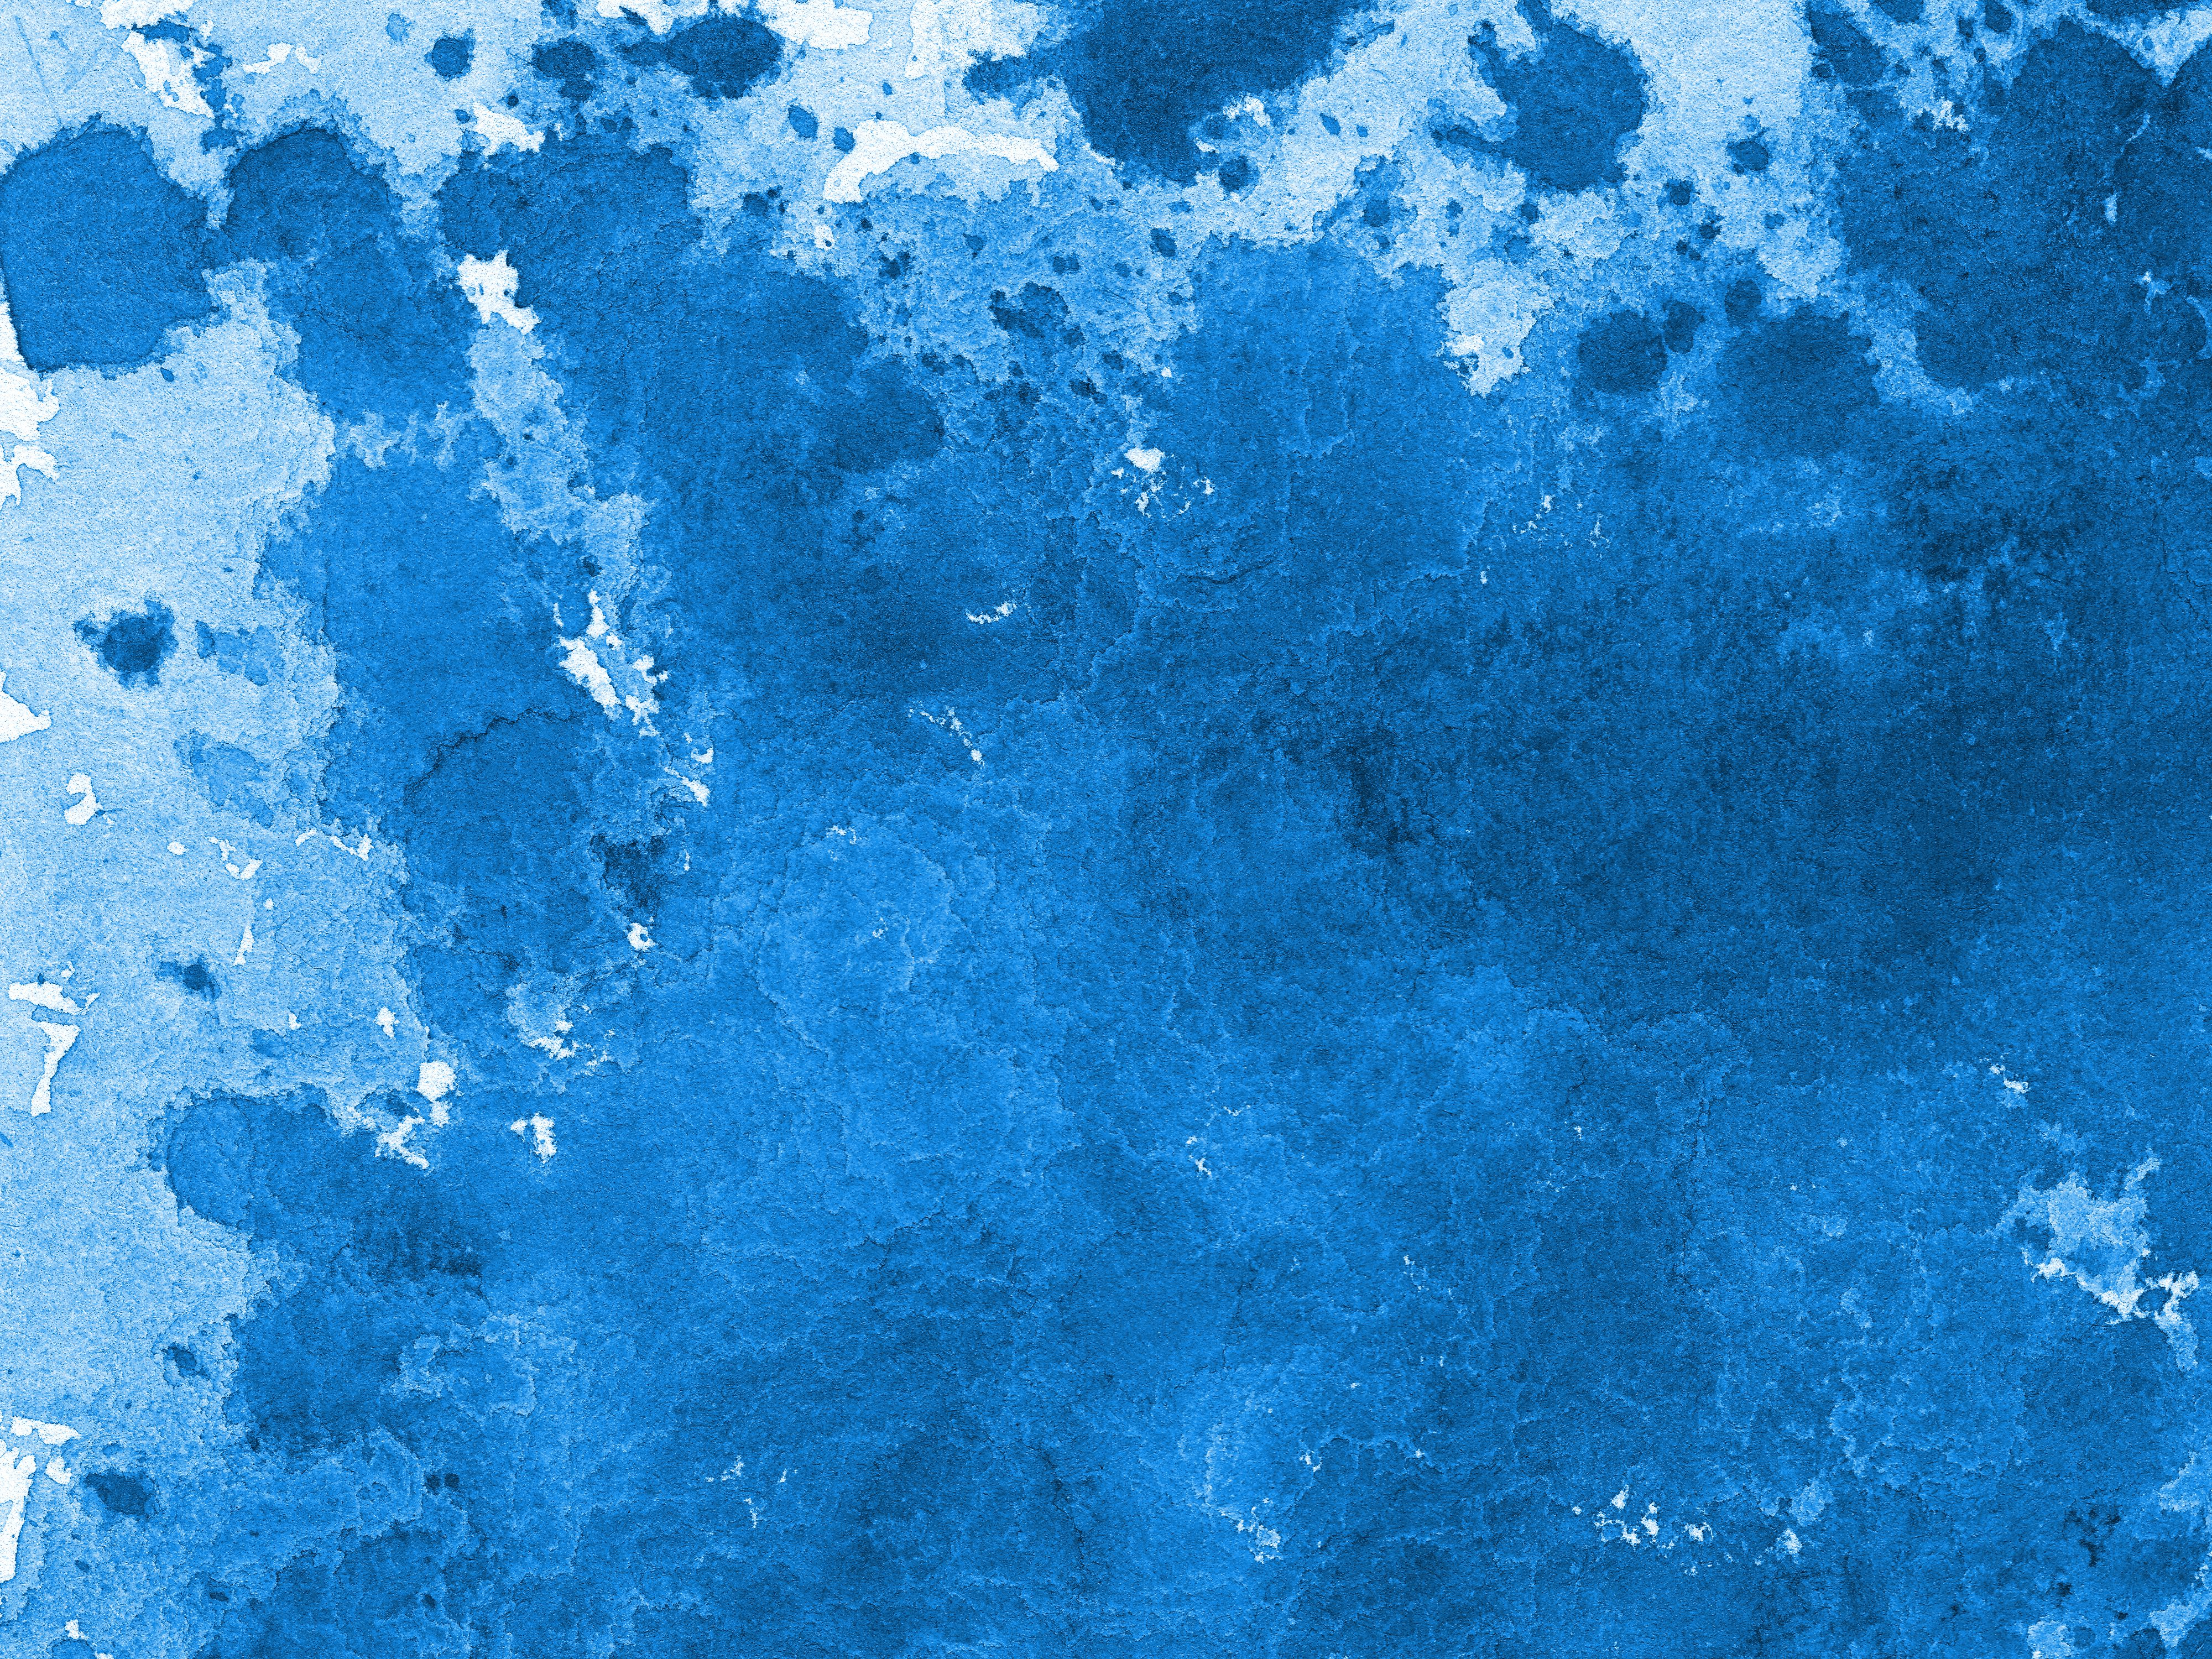 4 blue watercolor splash background  jpg